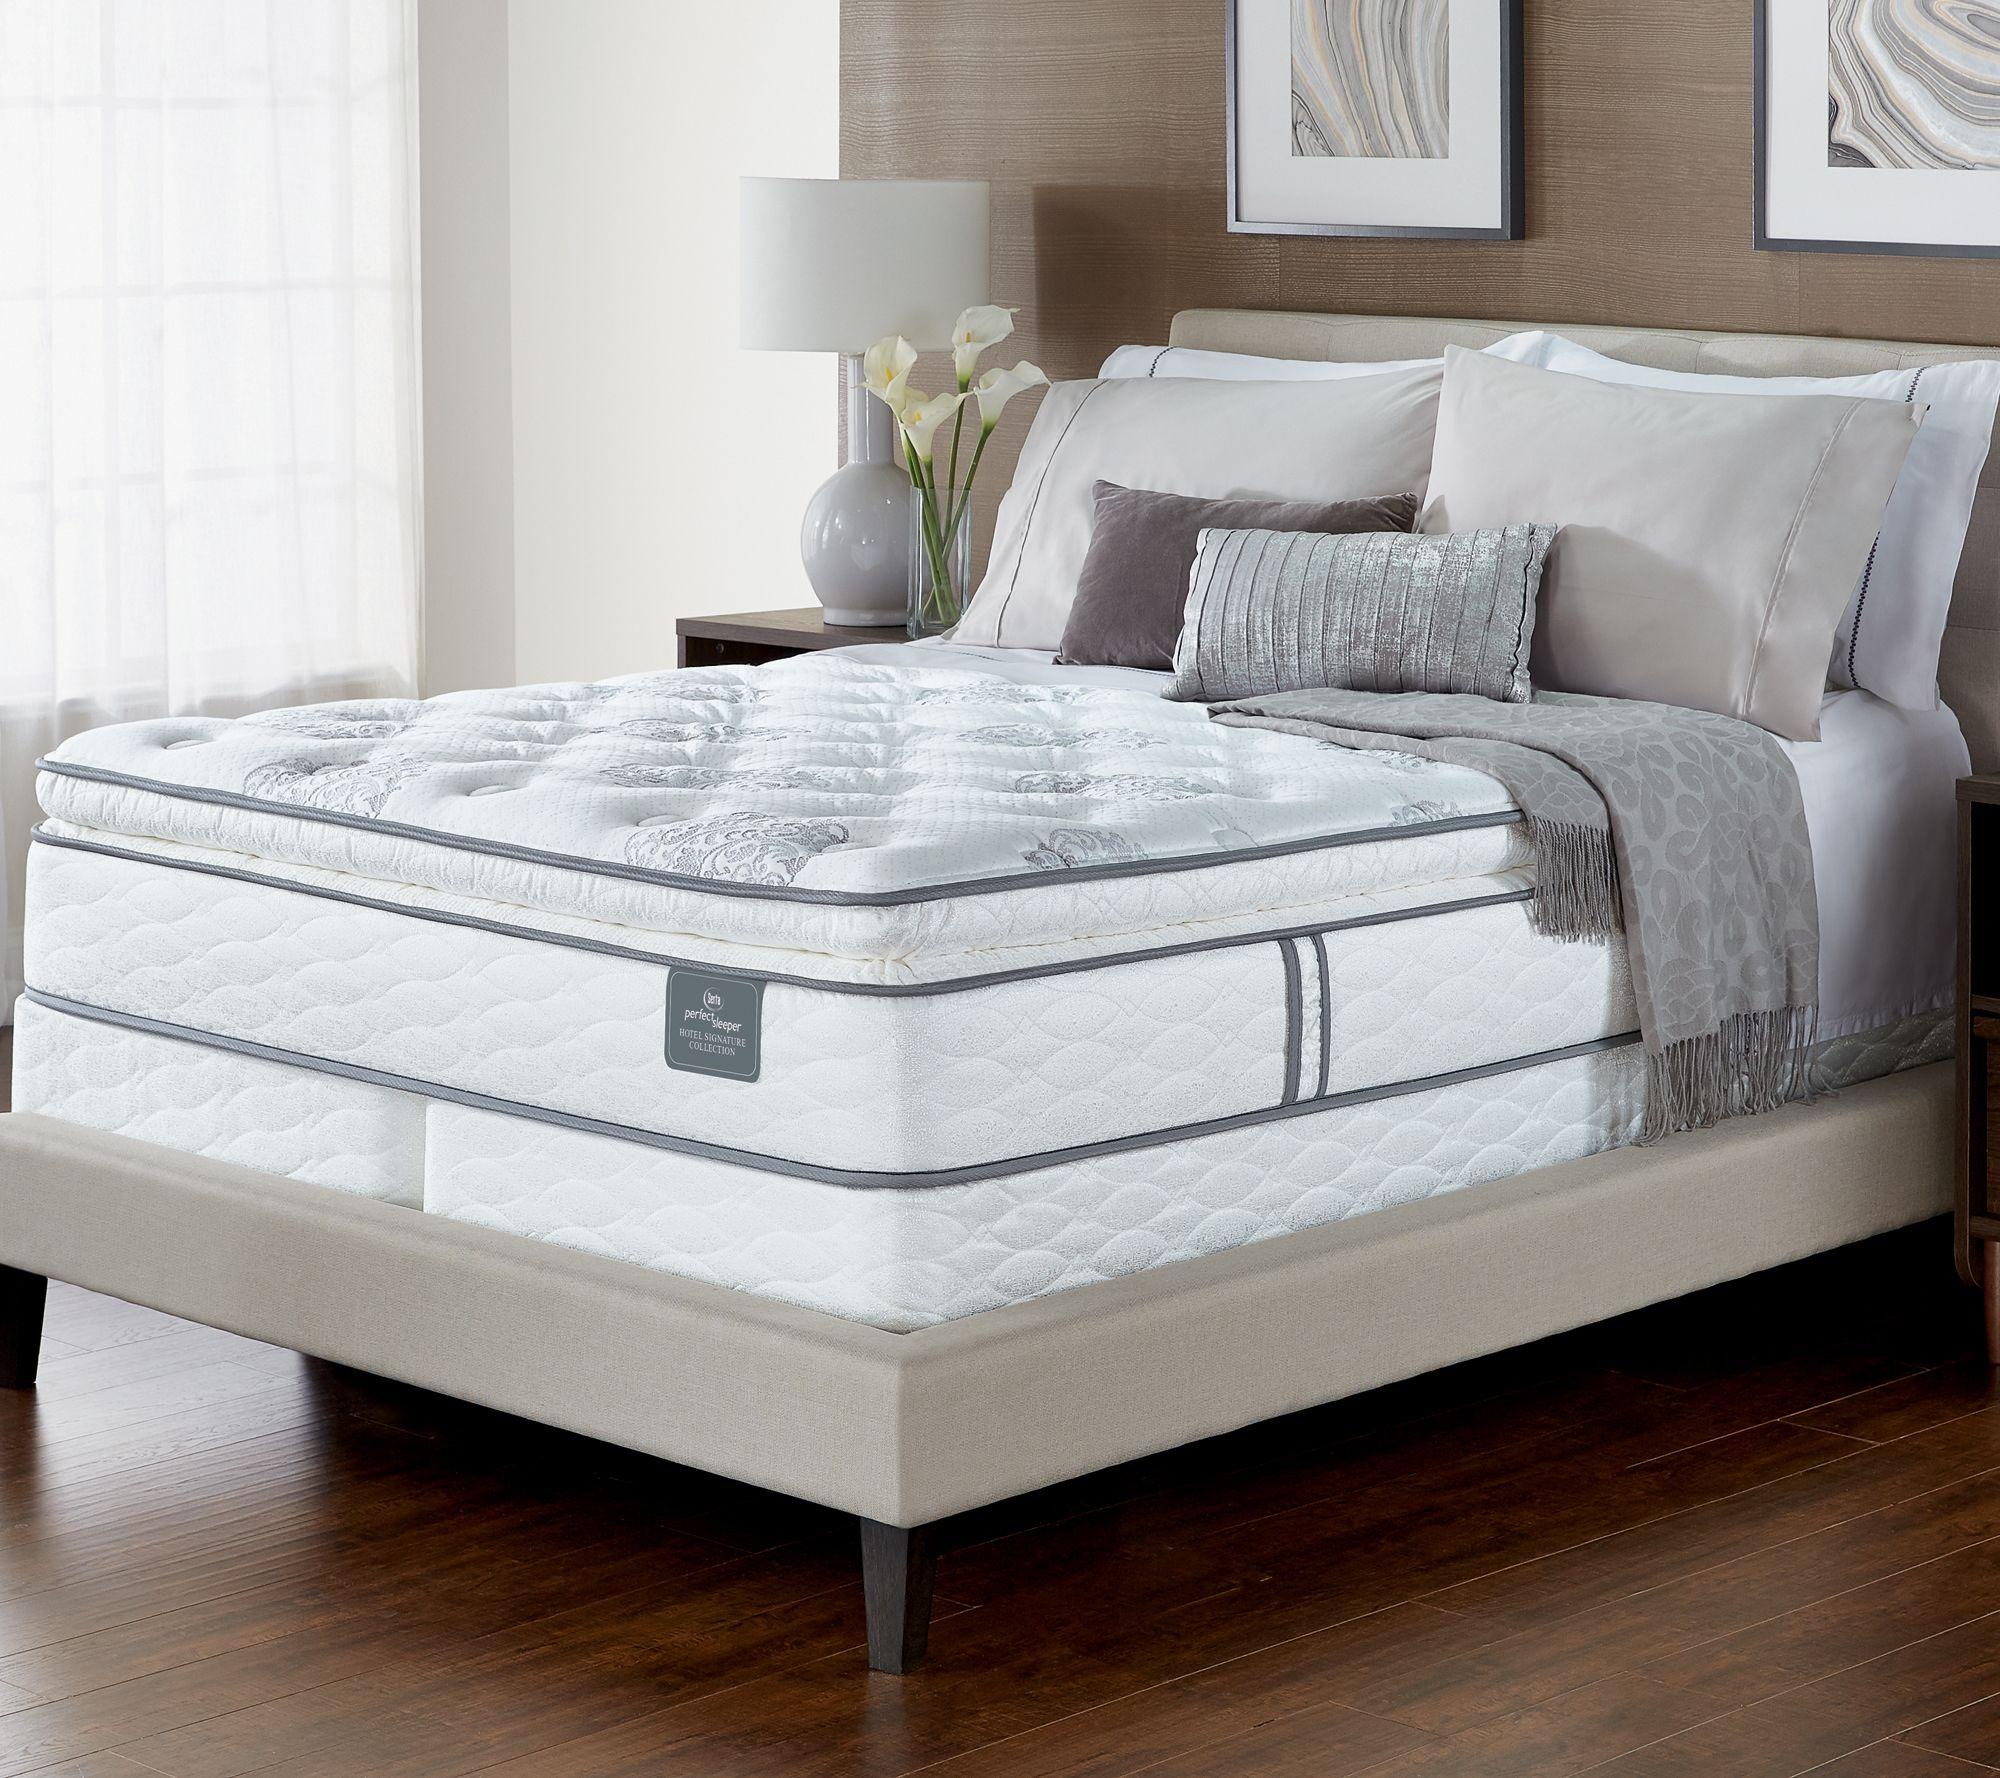 Serta Hotel Perfect Sleeper Reserve Suite Super Pillowtop